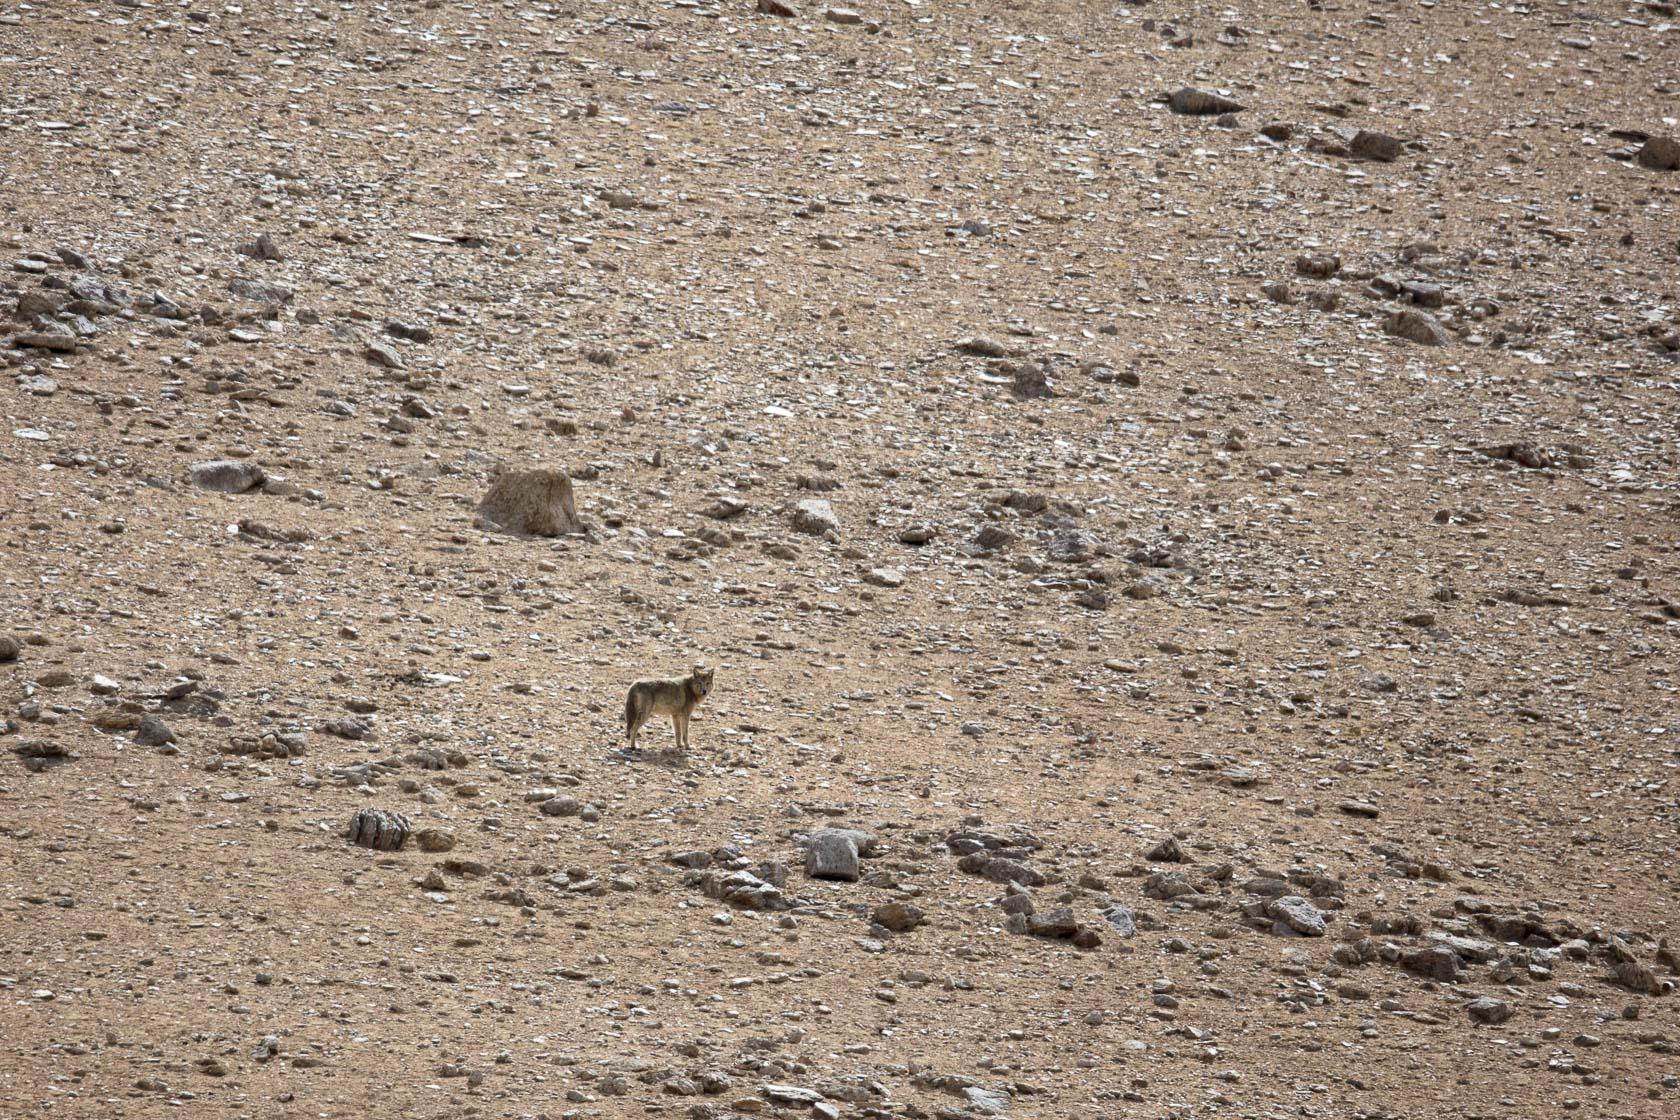 loup du Tibet (Canis lupus shanku) près du Tso kar au Ladakh